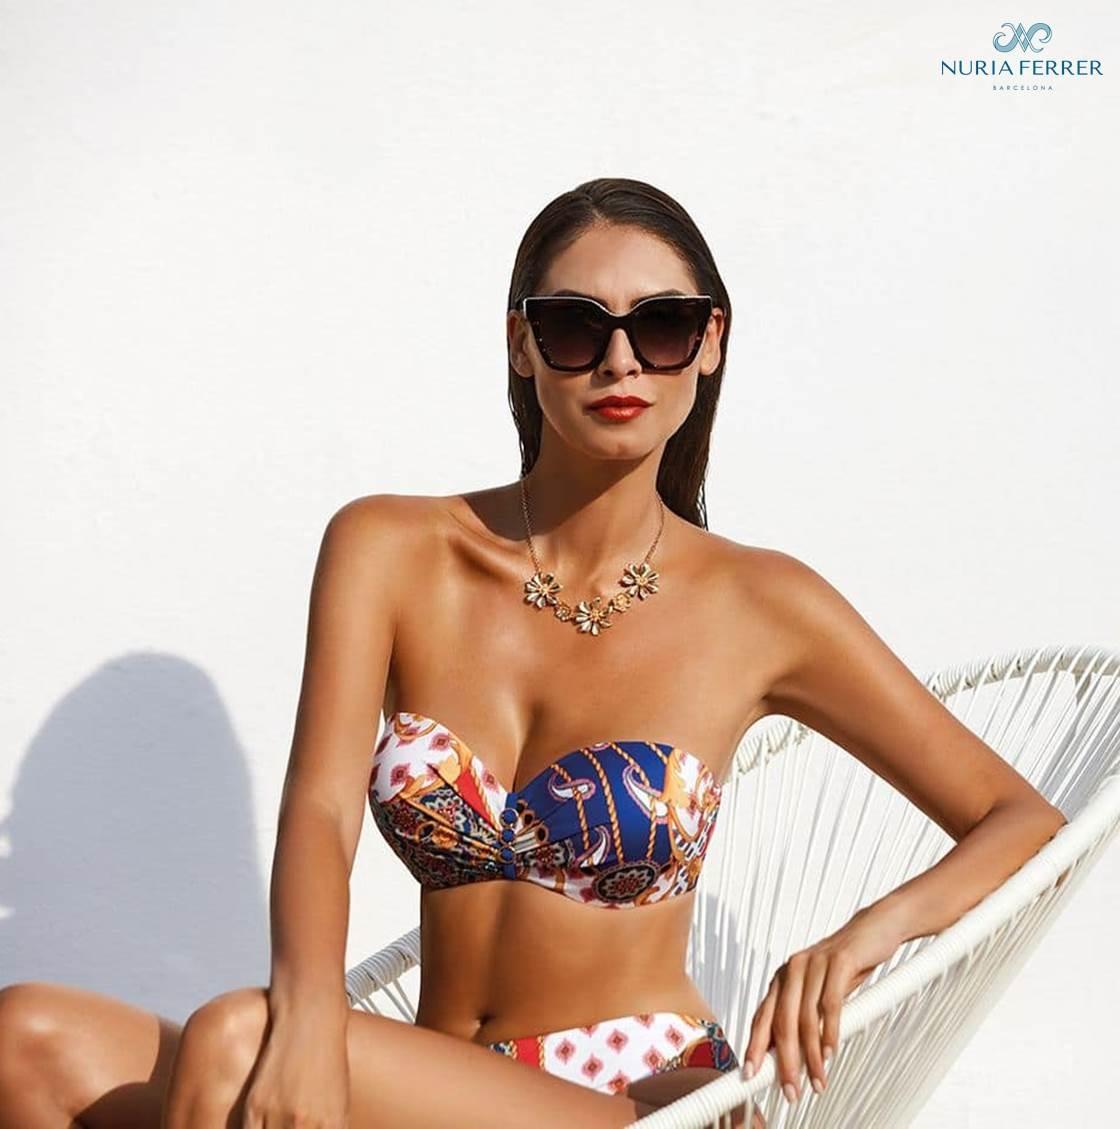 Bikini C Bandeau Foulard Nuria Ferrer